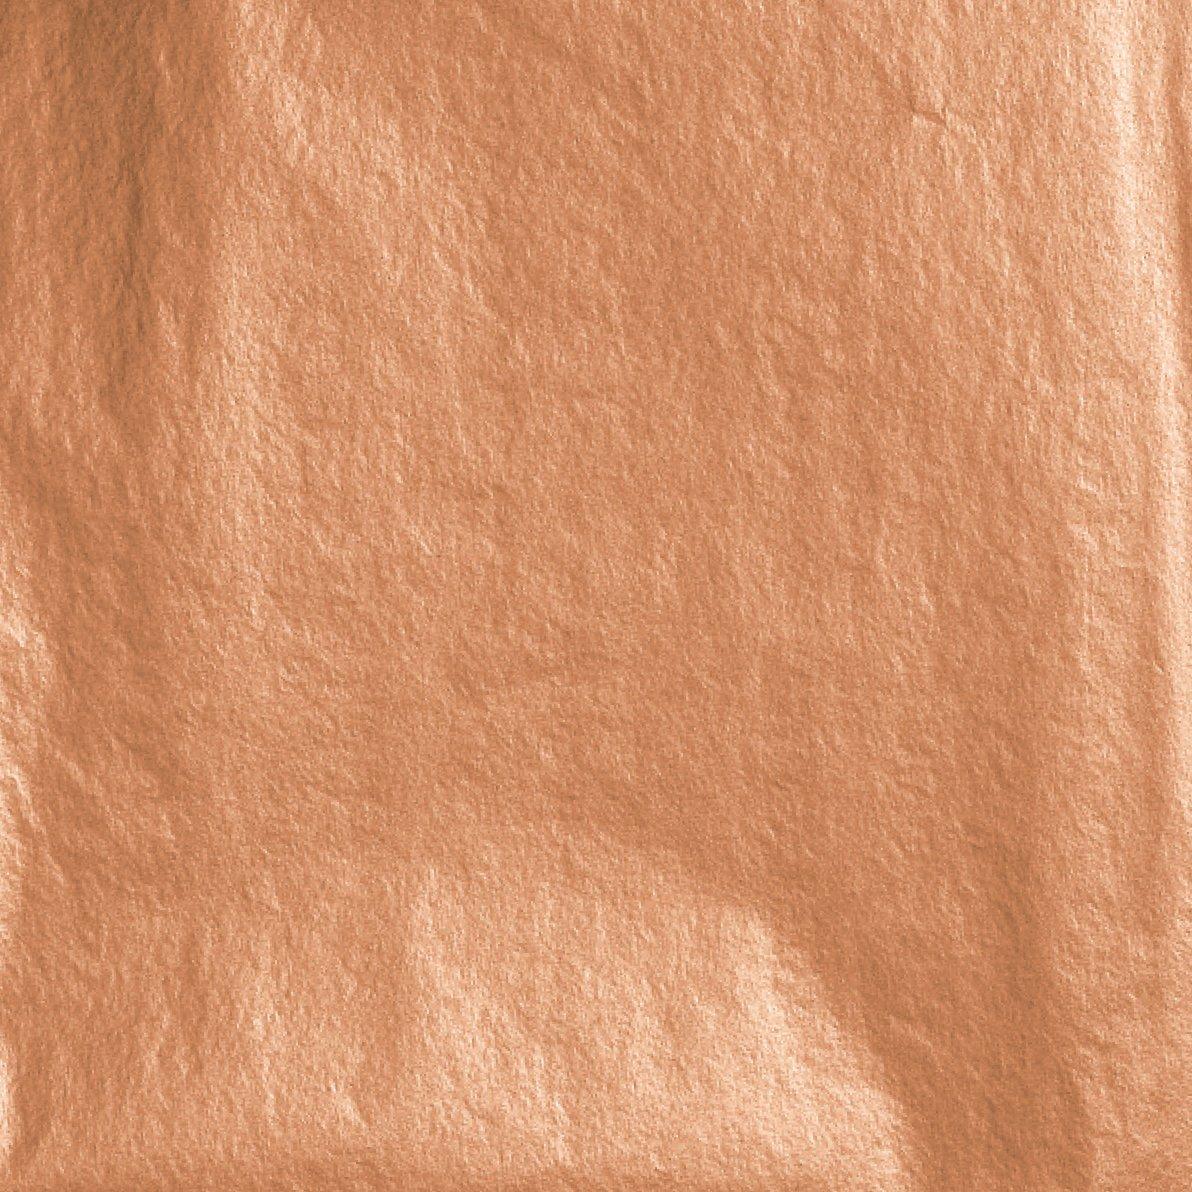 "Jillson & Roberts Bulk Gift Wrap, Matte Solid Copper, 1/2 Ream 417' x 24"""